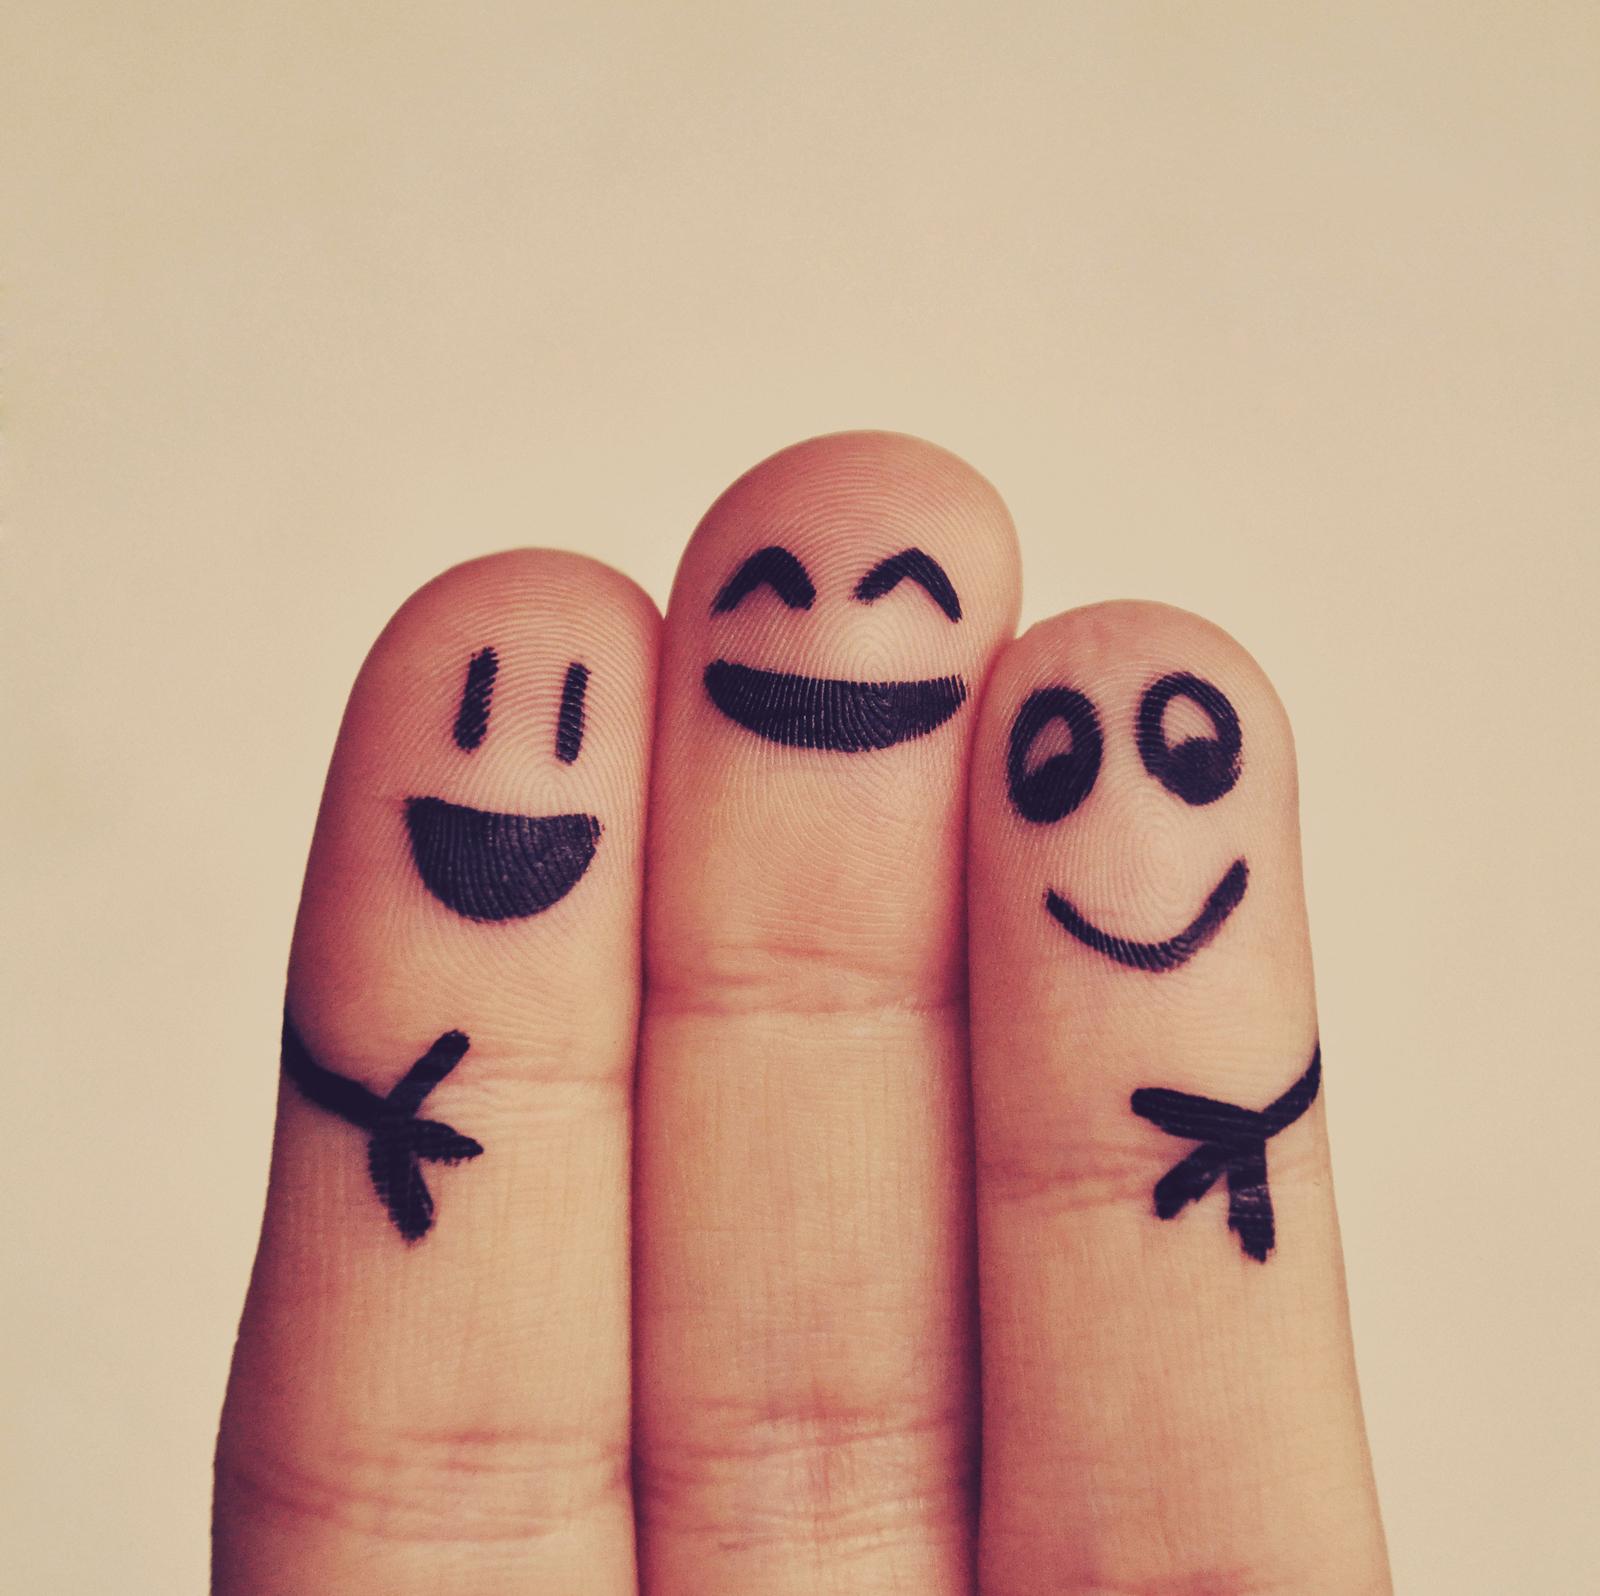 bigstock-happy-fingers-55664372.jpg